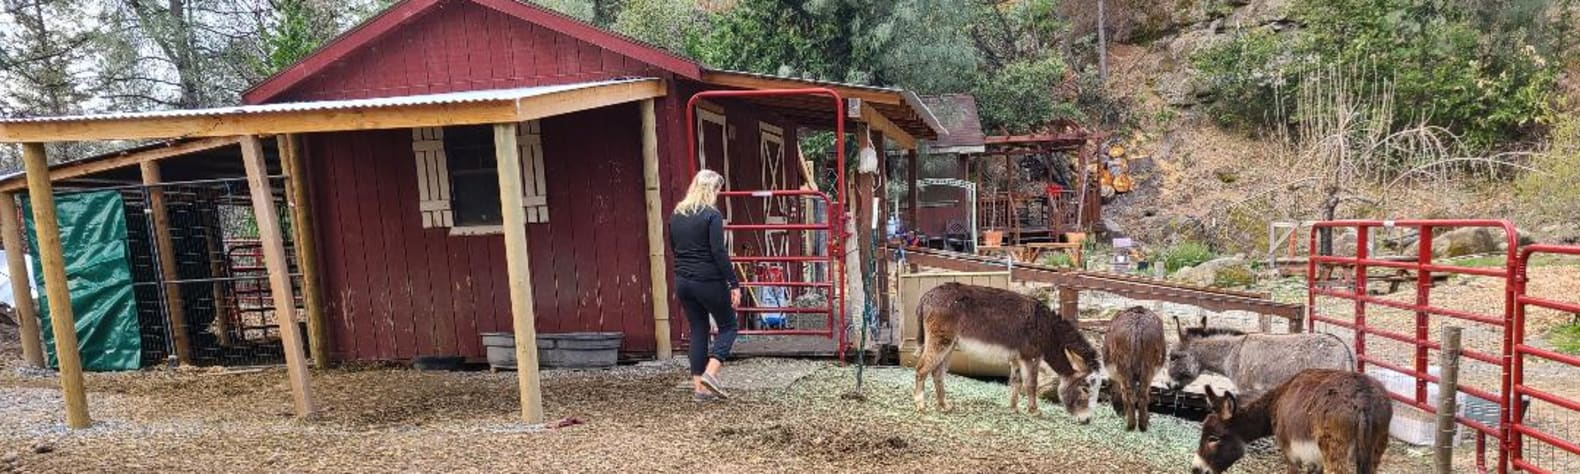 Murphys Mini Farm Stay